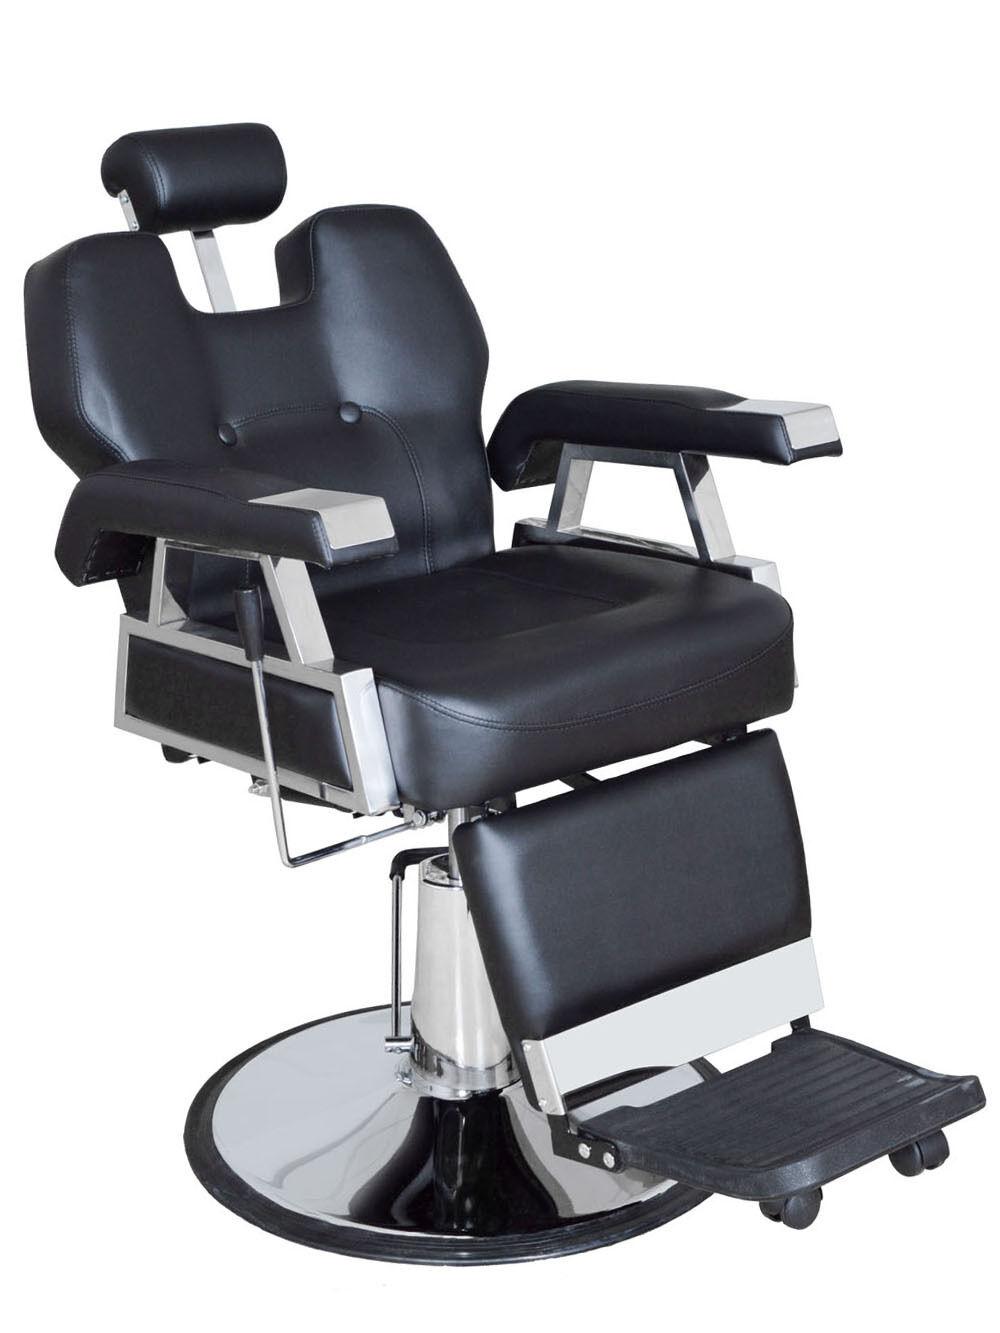 All Purpose Hydraulic Reclining Barber Chair Salon Beauty ...